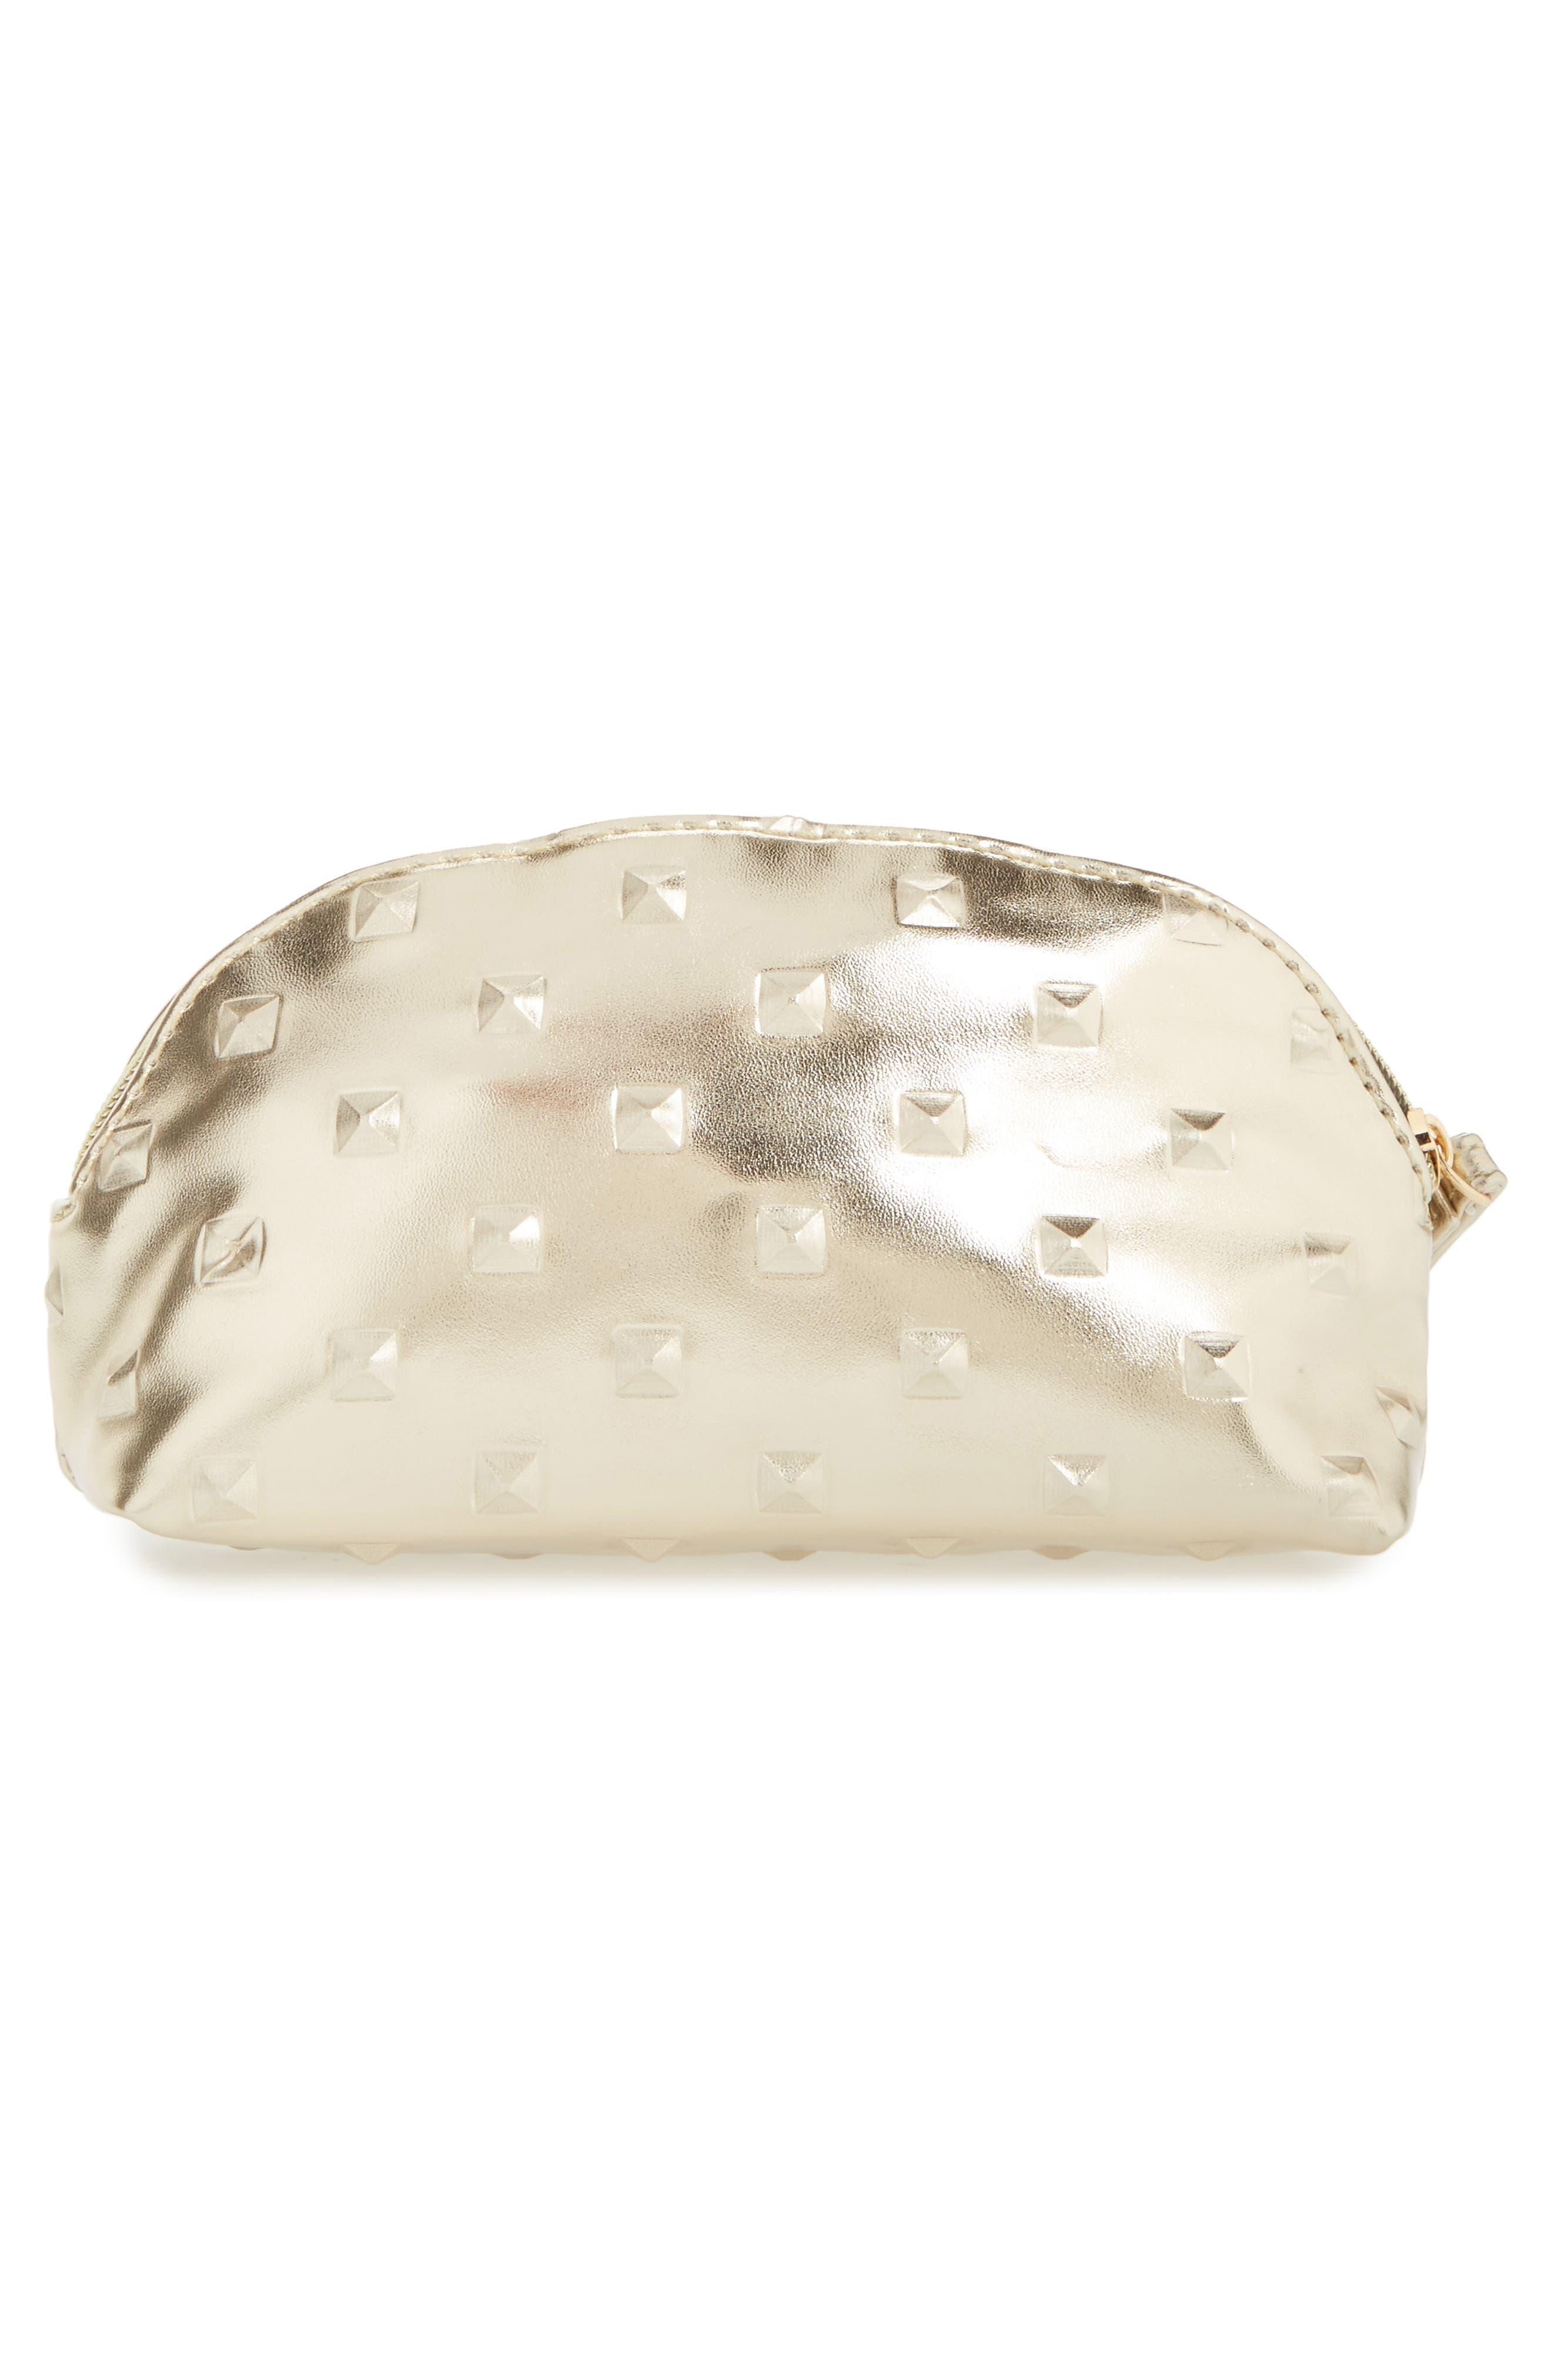 Diamond Embossed Metallic Cosmetics Bag,                             Alternate thumbnail 2, color,                             Gold